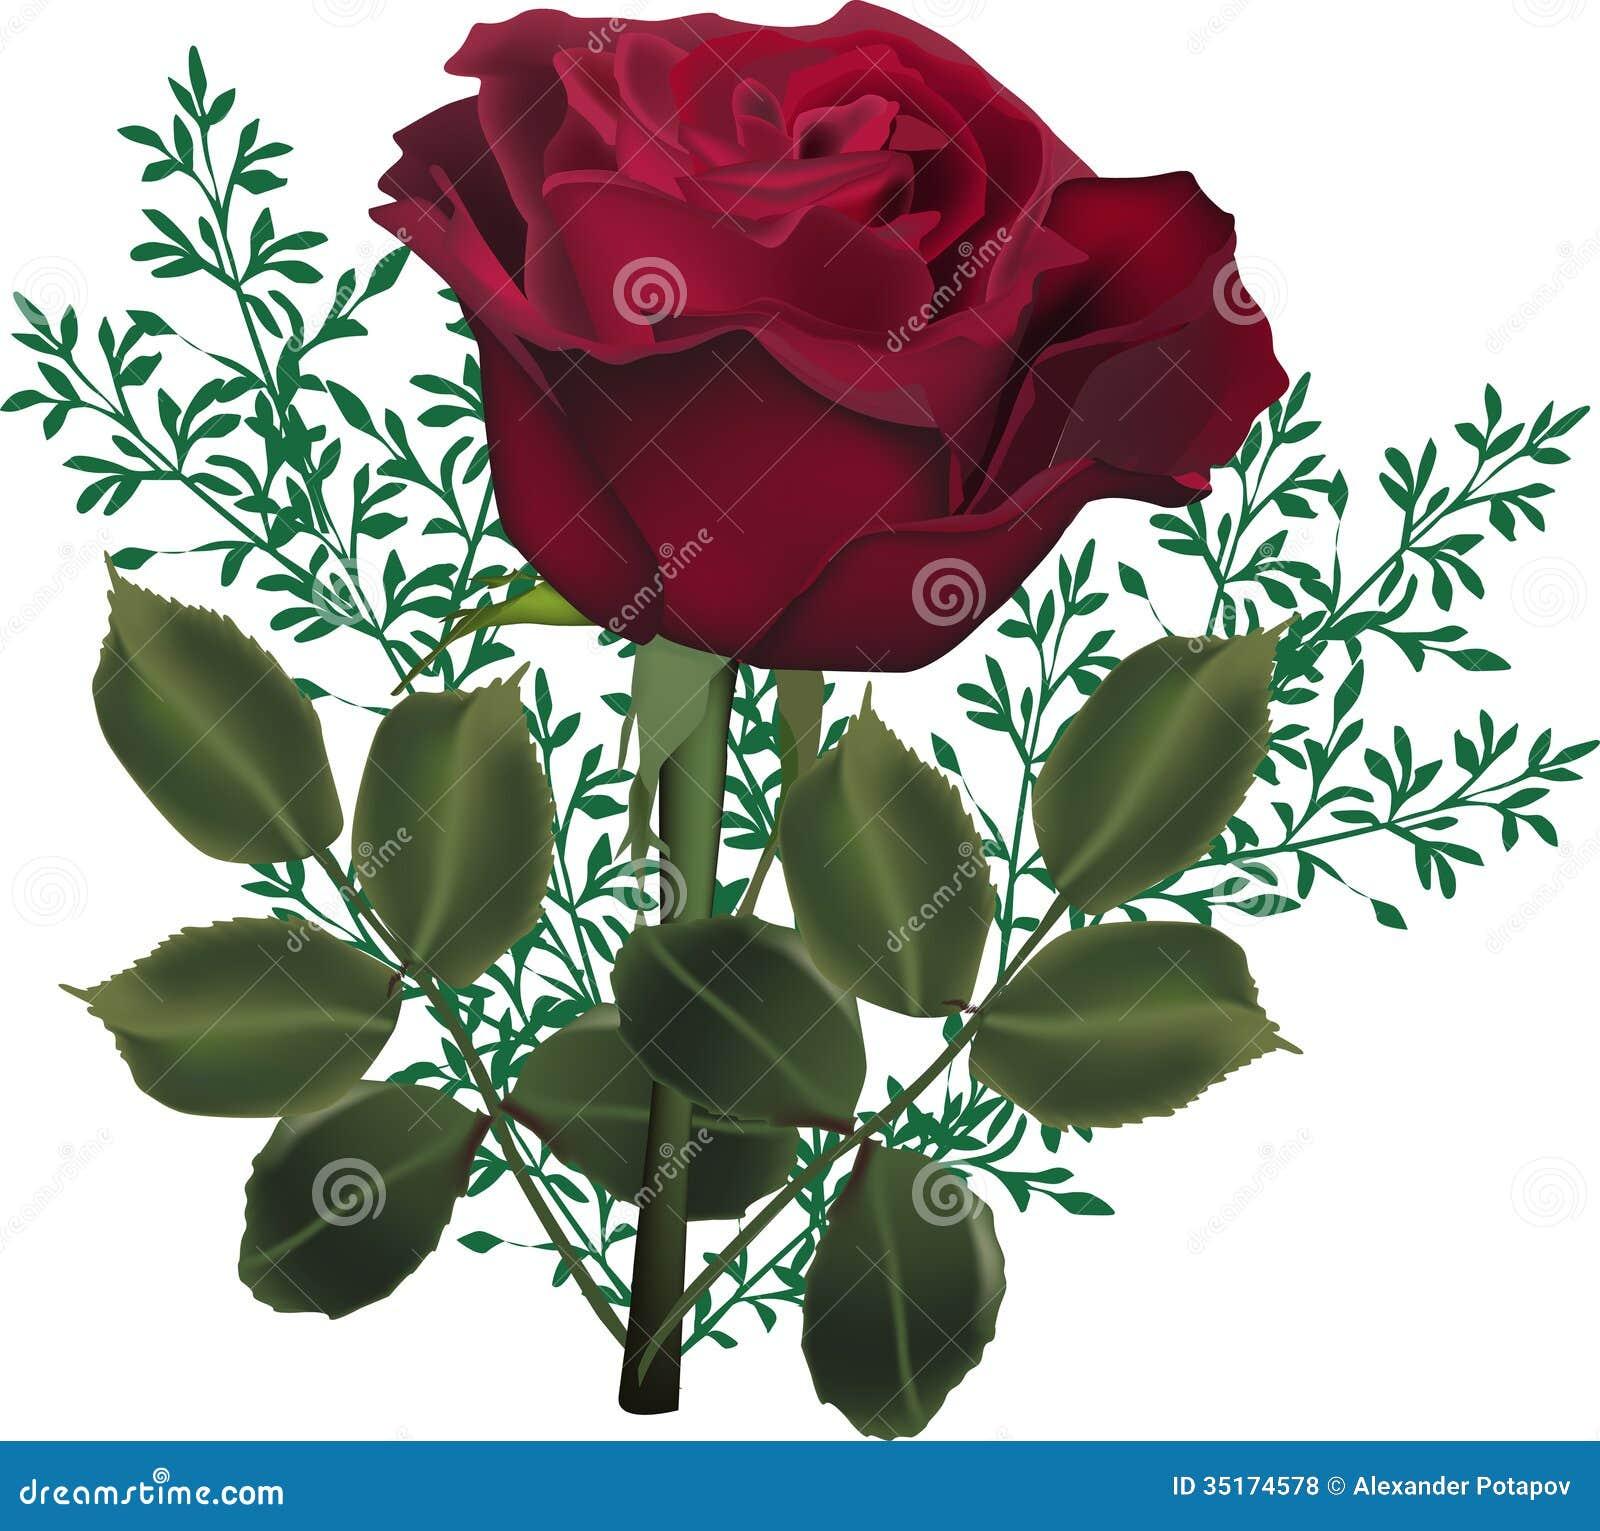 Dark Red Rose Flower In Green Plants Illustration 35174578 Megapixl